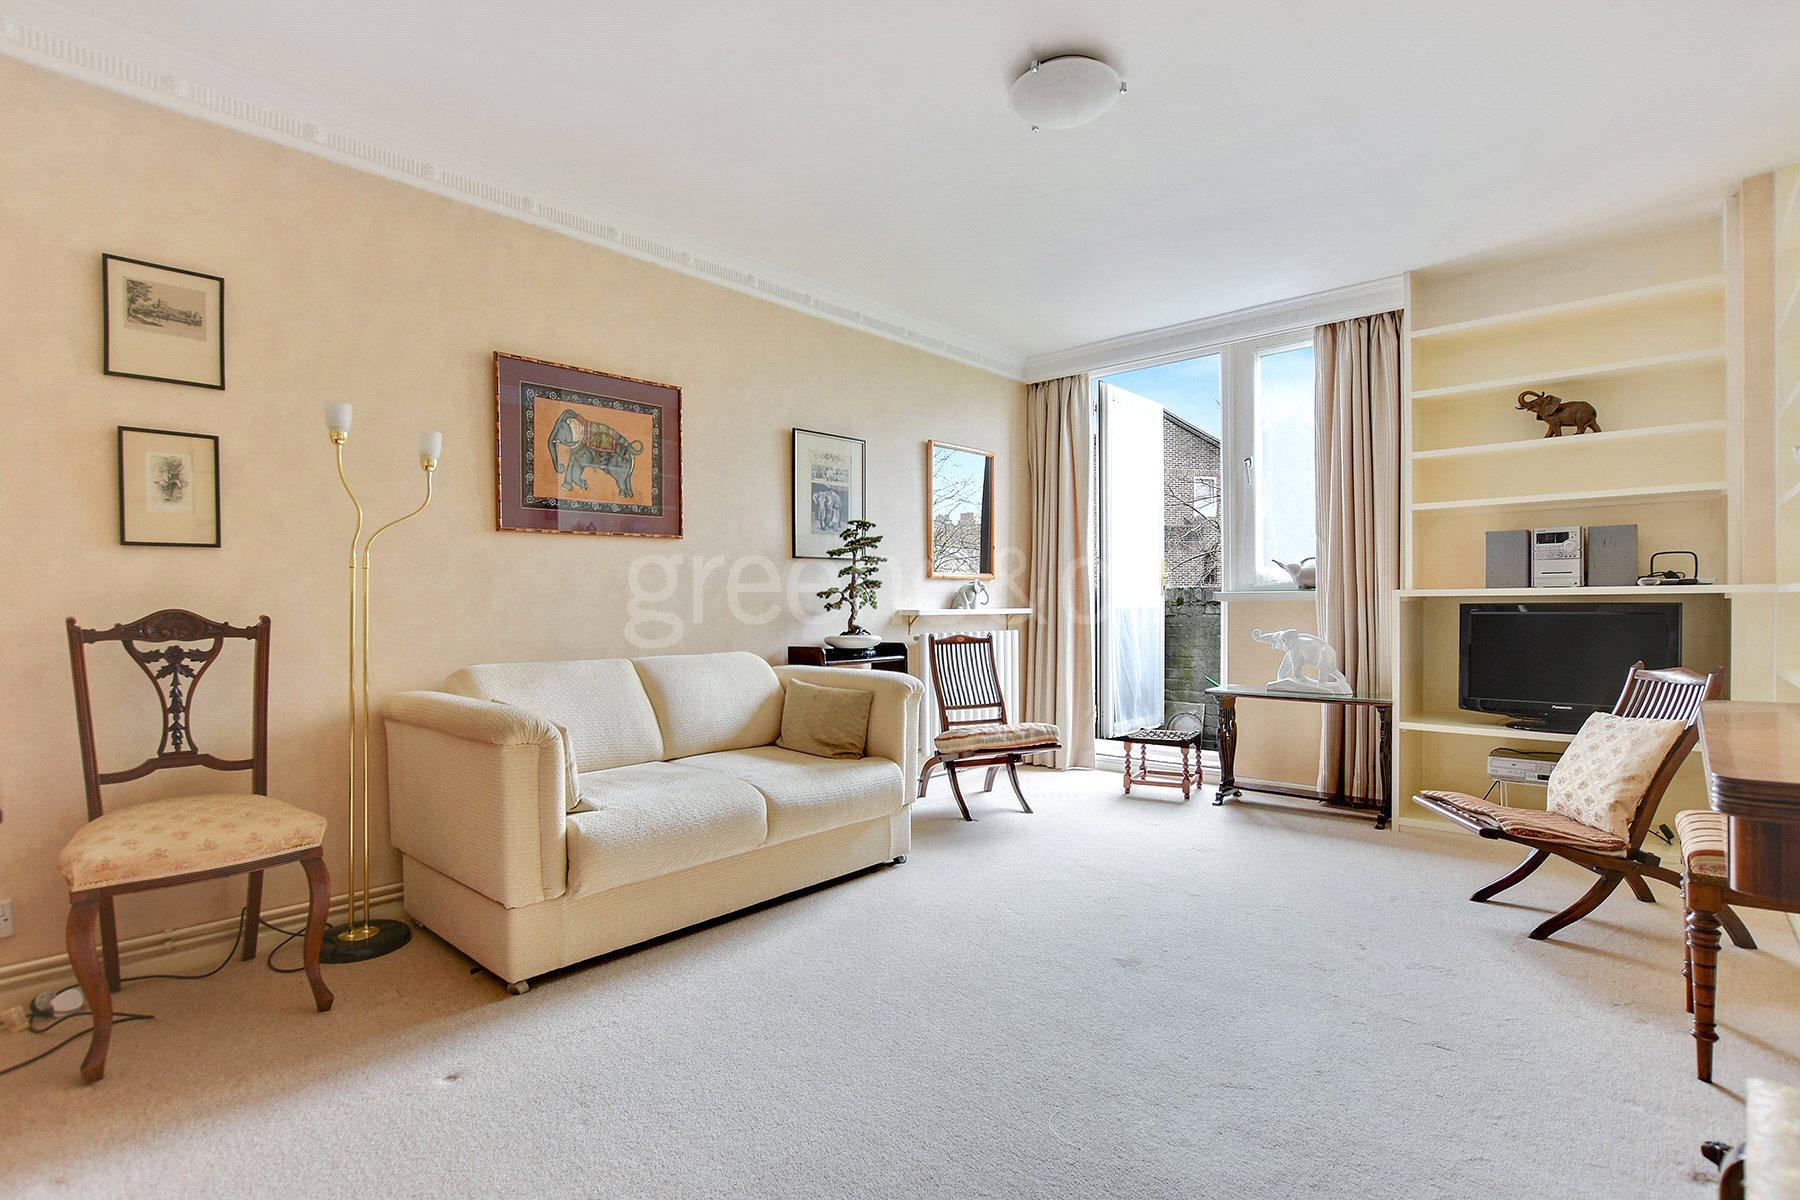 1 Bedroom Flat for sale in Burlington Close, Maida Vale, London, W9